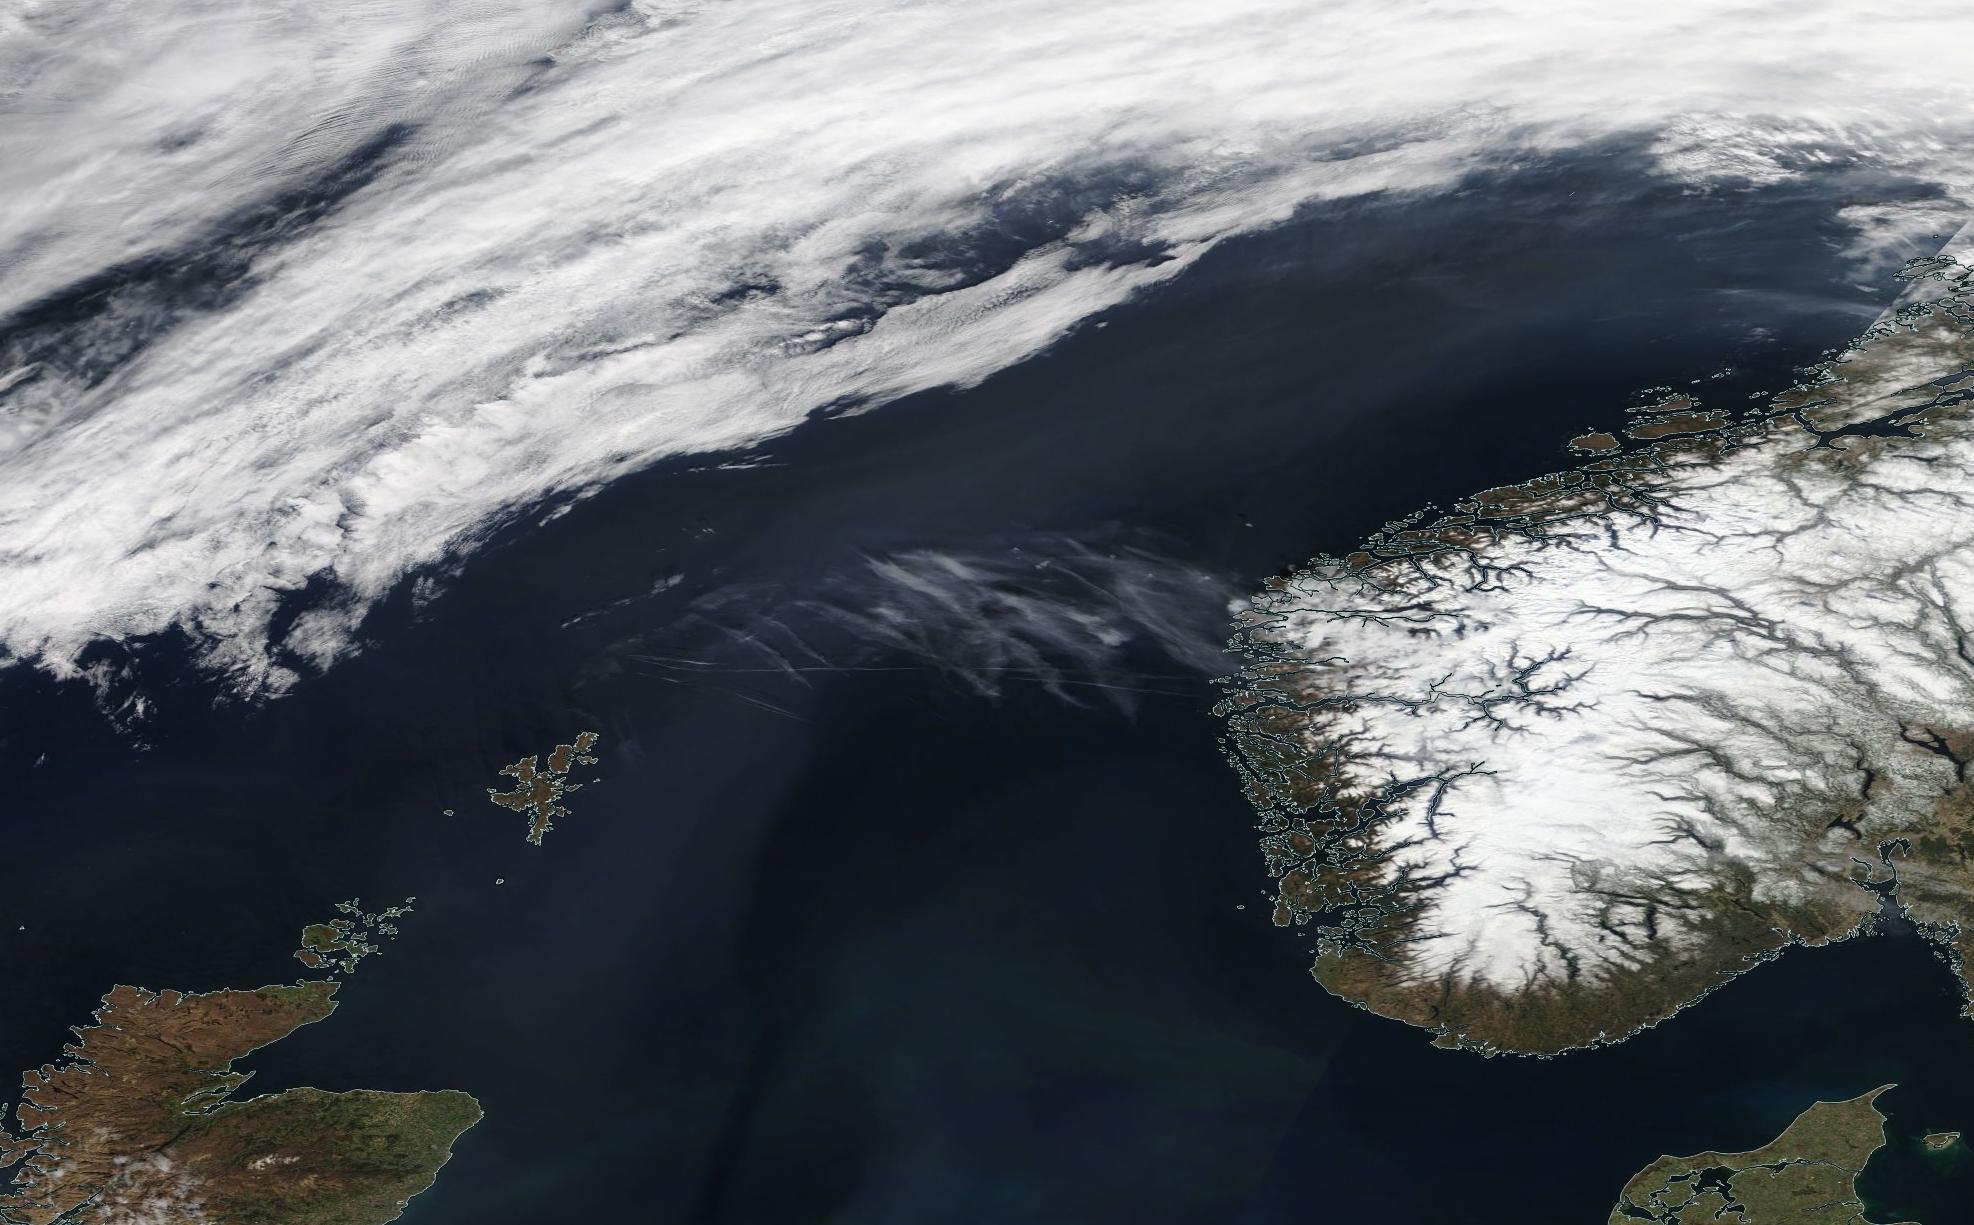 chemtrails Norwegian Sea Easter Monday 21 April 2019 ... https://go.nasa.gov/2URbr2a